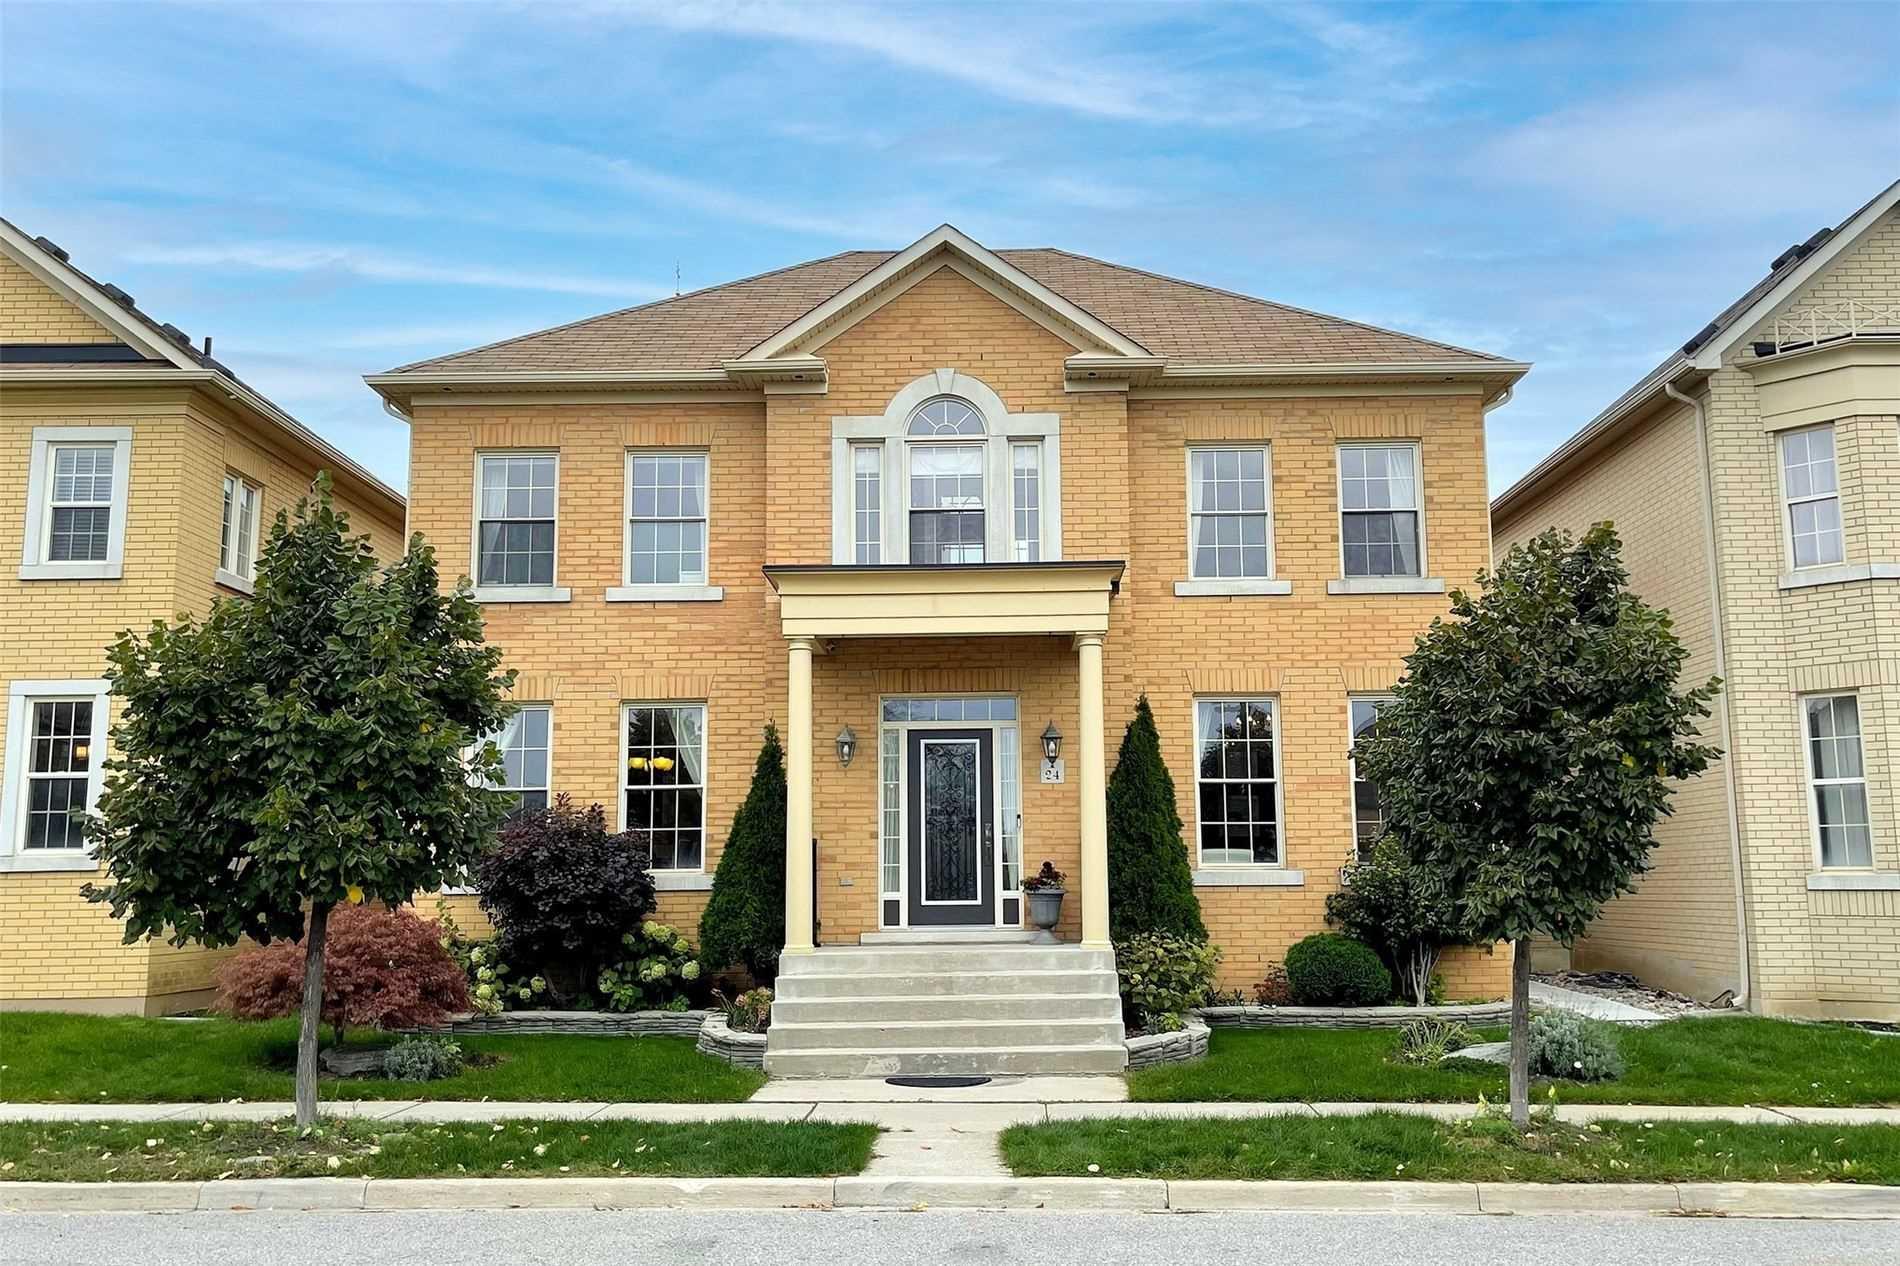 Detached house For Sale In Markham - 24 Bembridge Dr, Markham, Ontario, Canada L6C0J8 , 4 Bedrooms Bedrooms, ,5 BathroomsBathrooms,Detached,For Sale,Bembridge